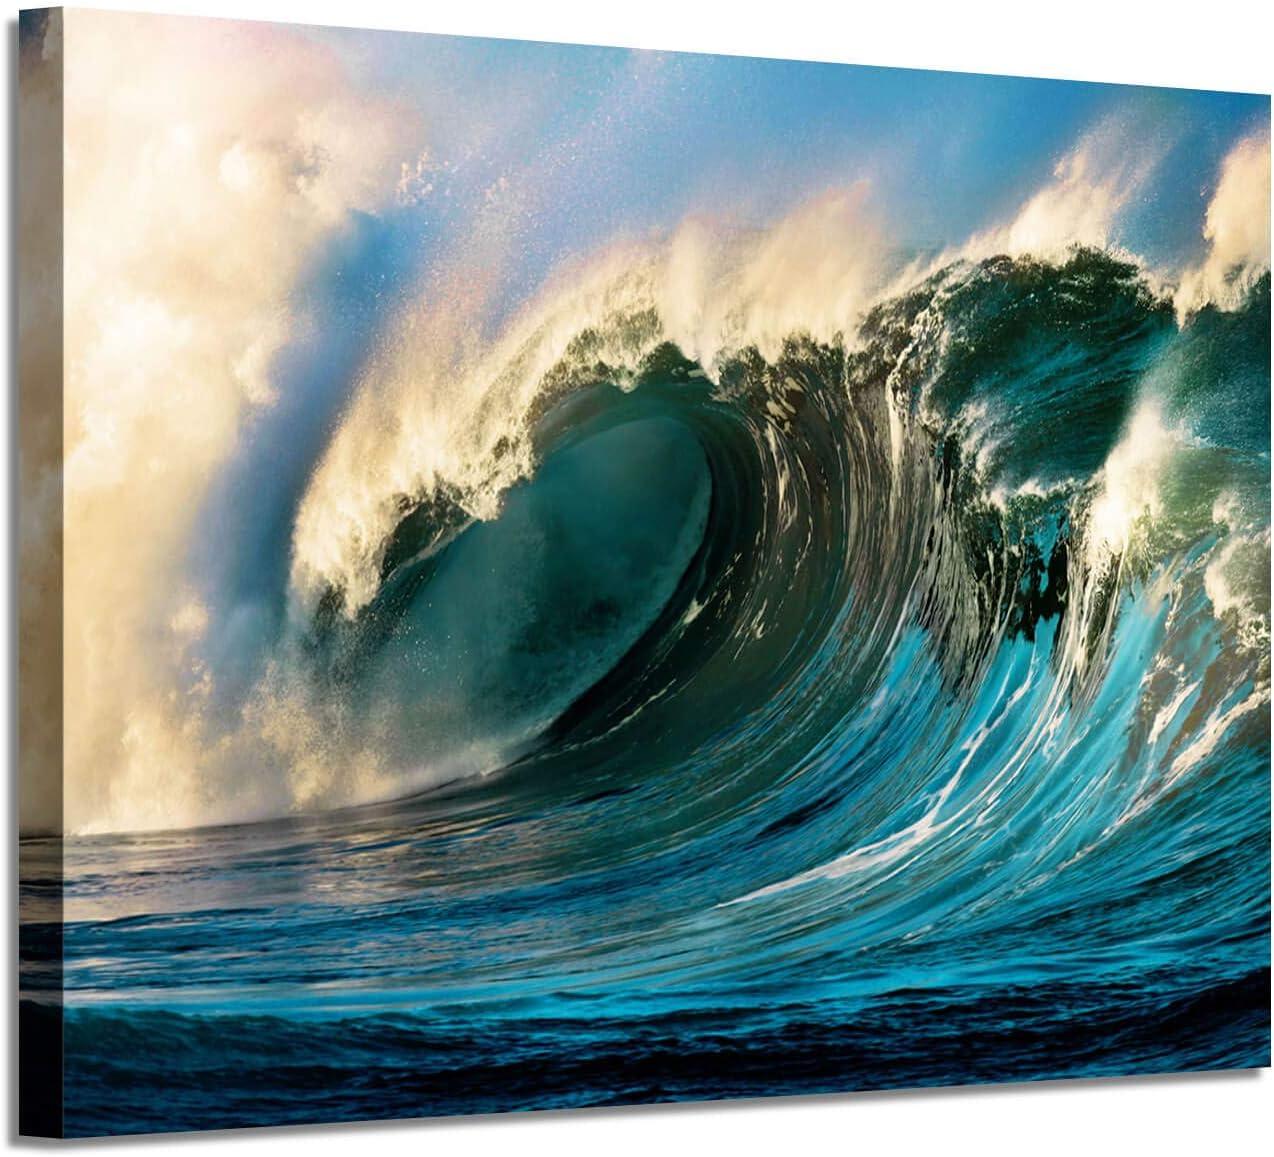 Square Coastal Art Print Printable Ocean Photo Square Ocean Art Print Ocean Wave Print Aerial Beach Photo Ocean Photo Print